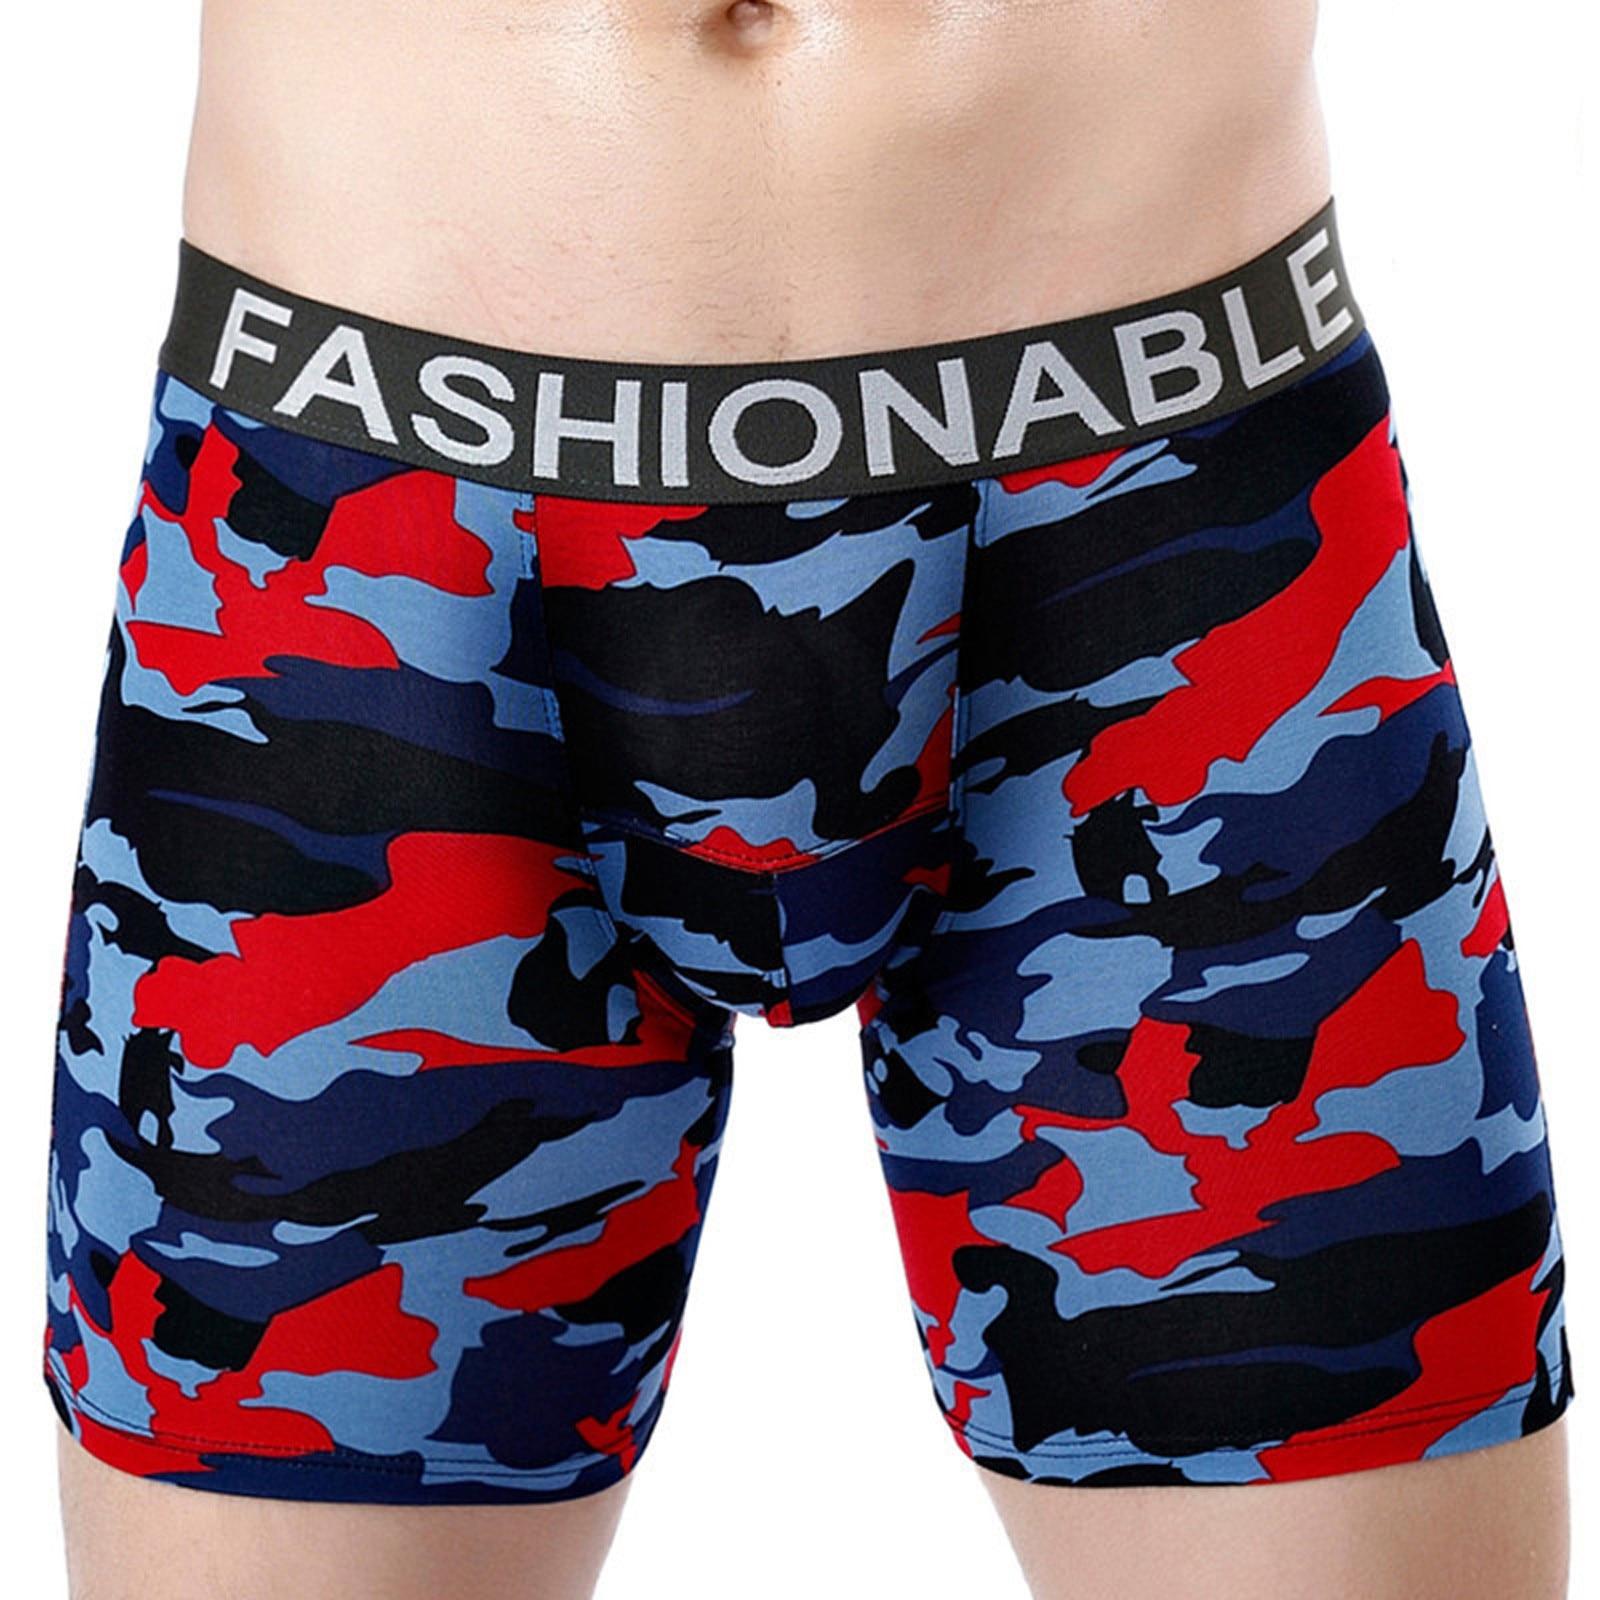 Cotton Men's Underwear Boxers Male Panties Breathable Sexy Man Boxer Solid Underpants Comfortable Pl